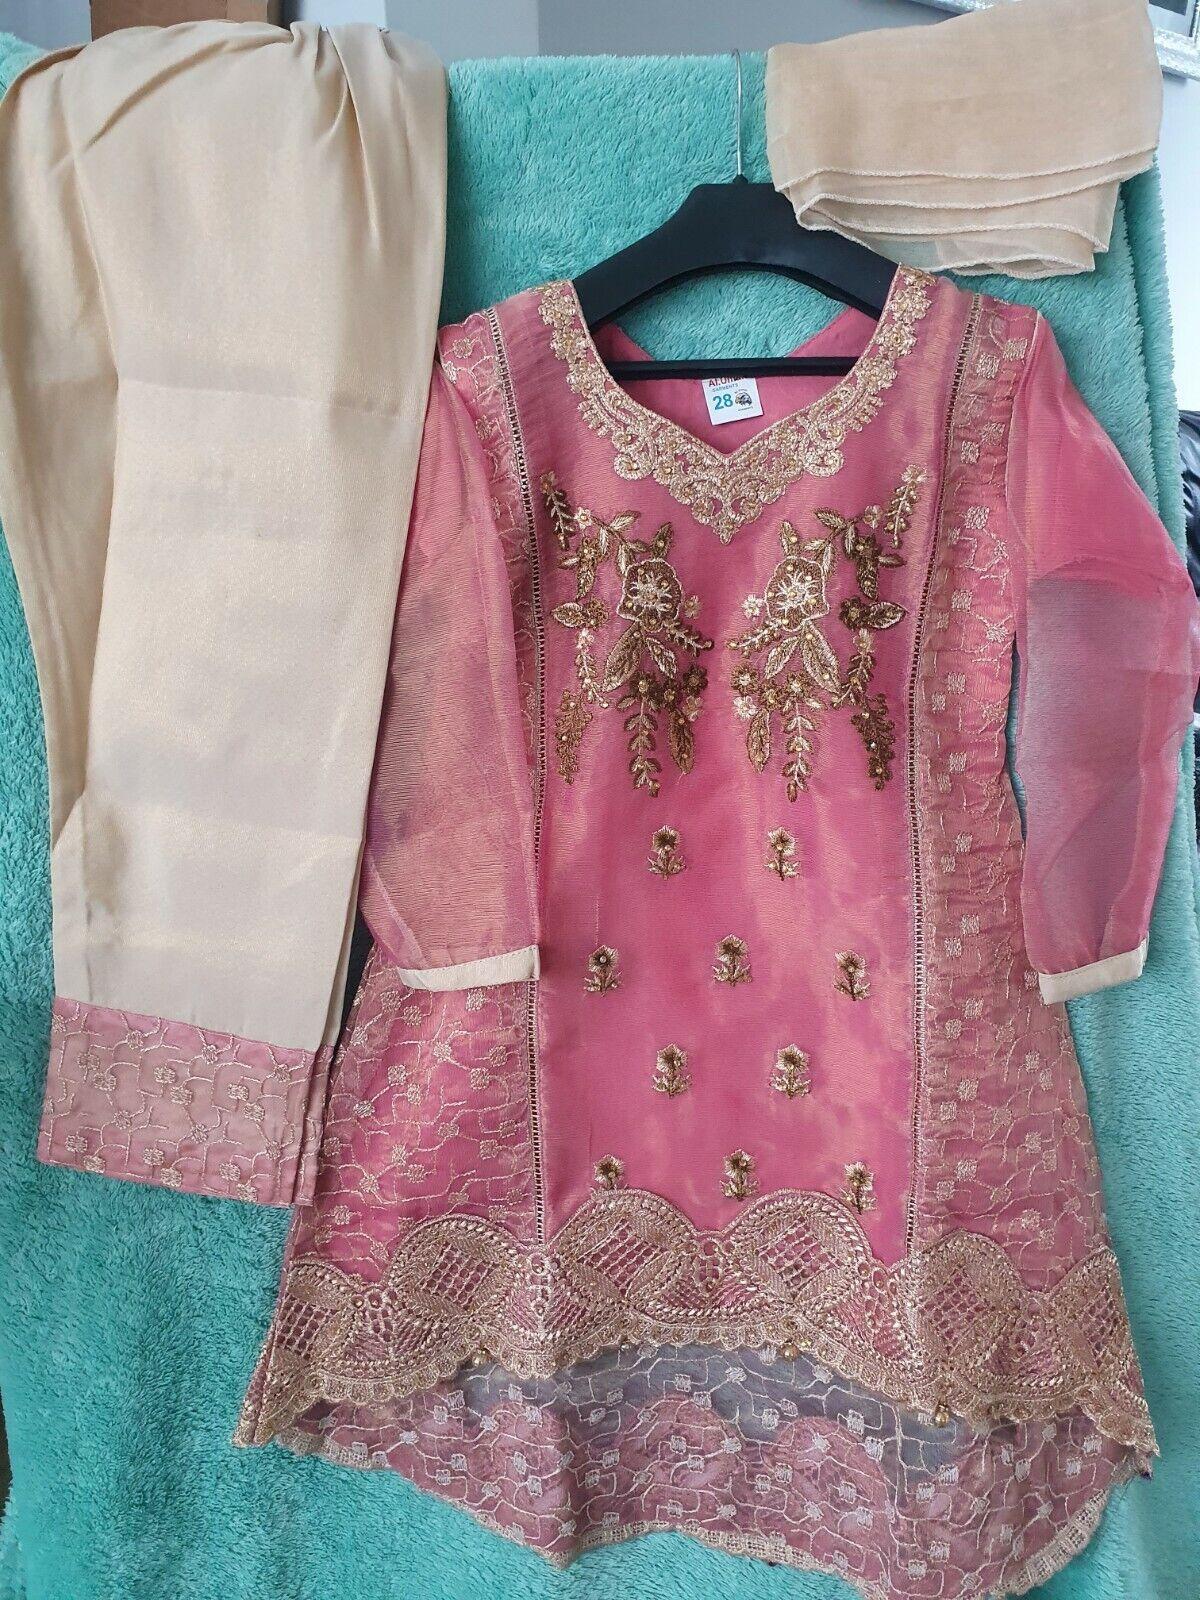 Pakistani Girls Wedding Party Eid Dress Suit sz 36 ~ 9-10y Shimmering Pink Gold